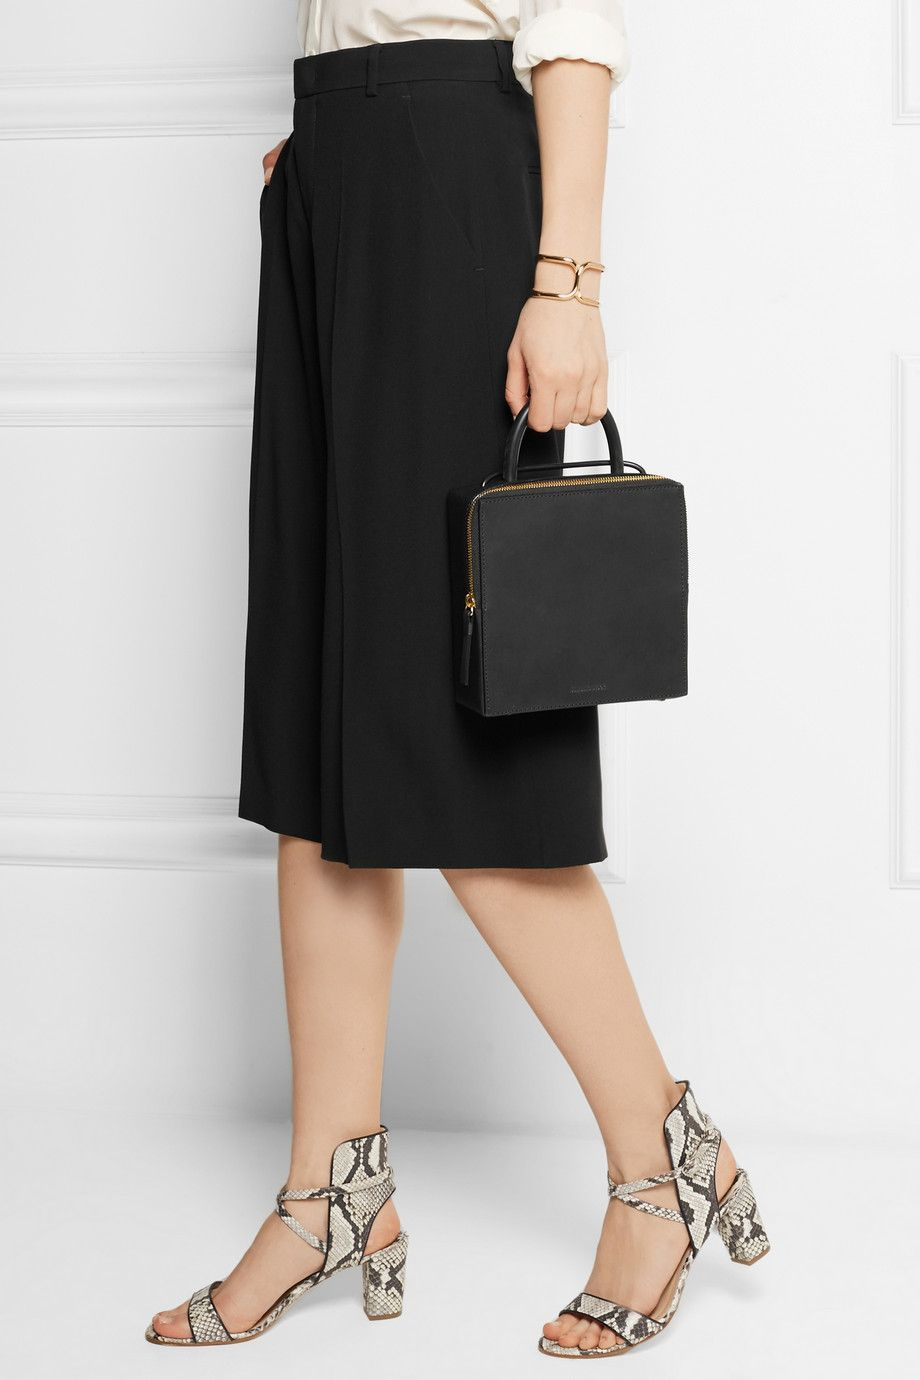 Box Leather Shoulder Bag - Black Building Block sleFK3PyiR